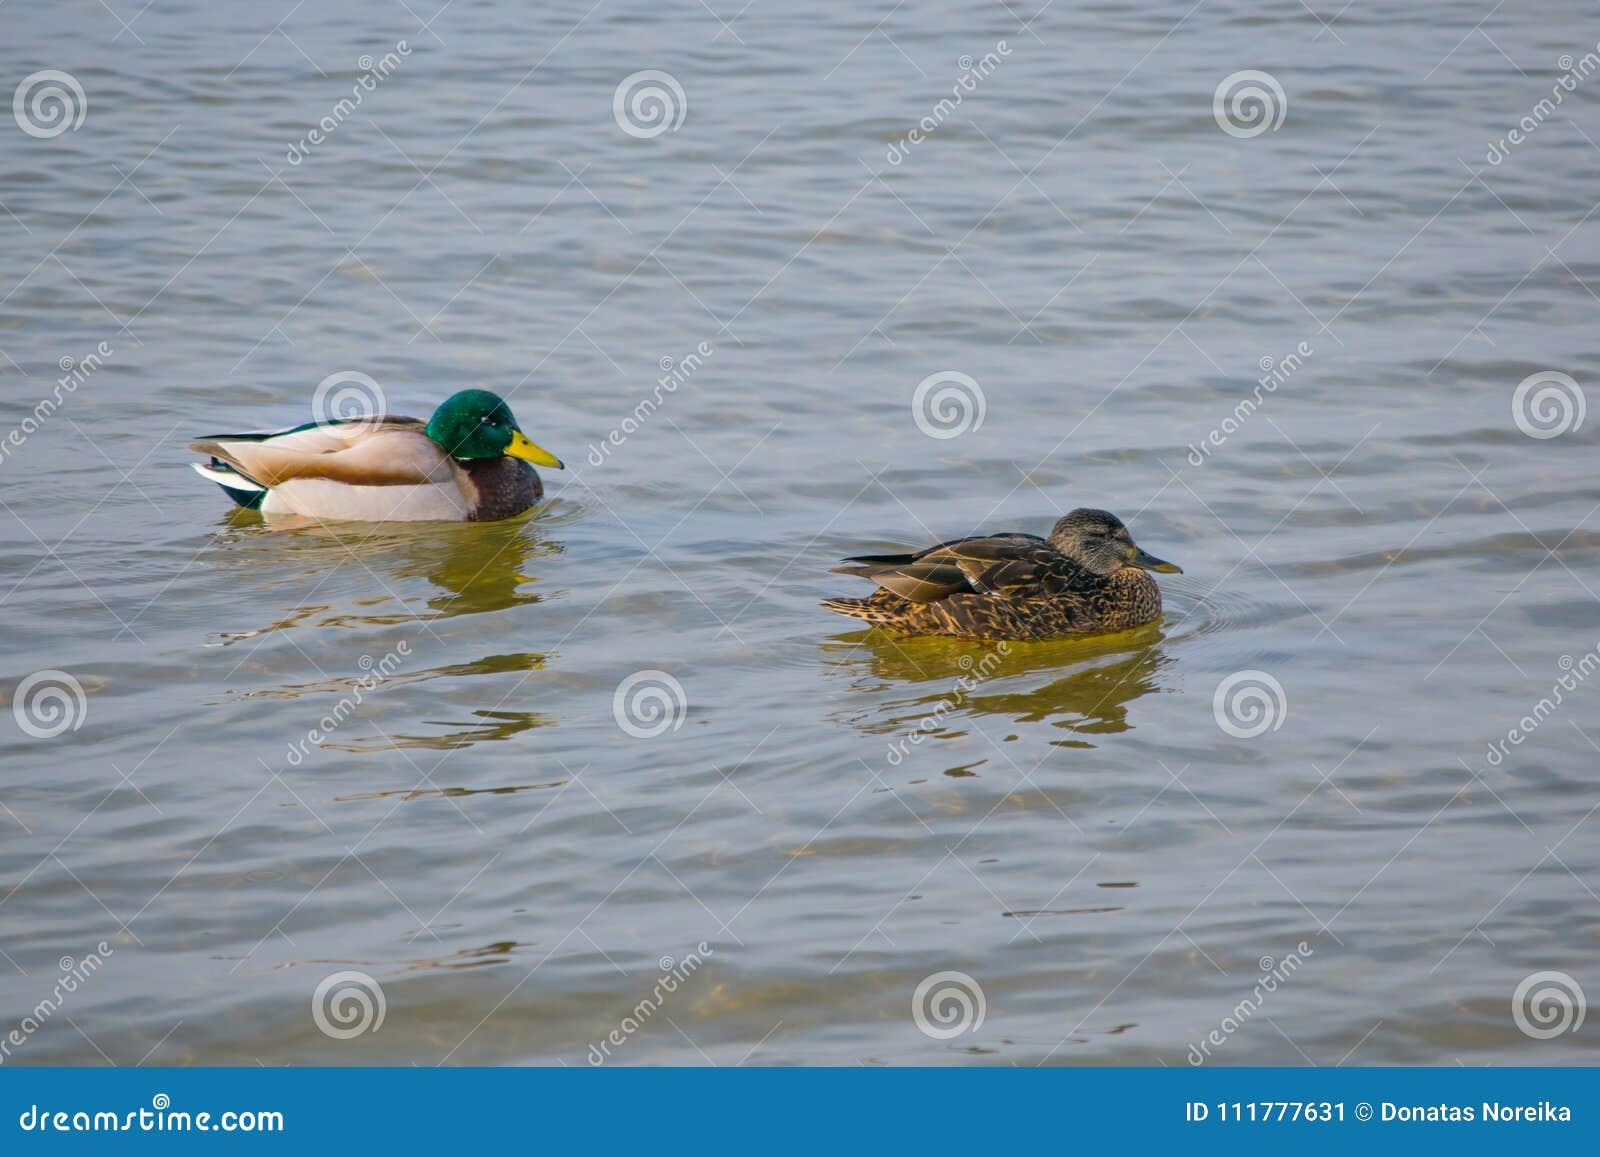 2 утки в воде